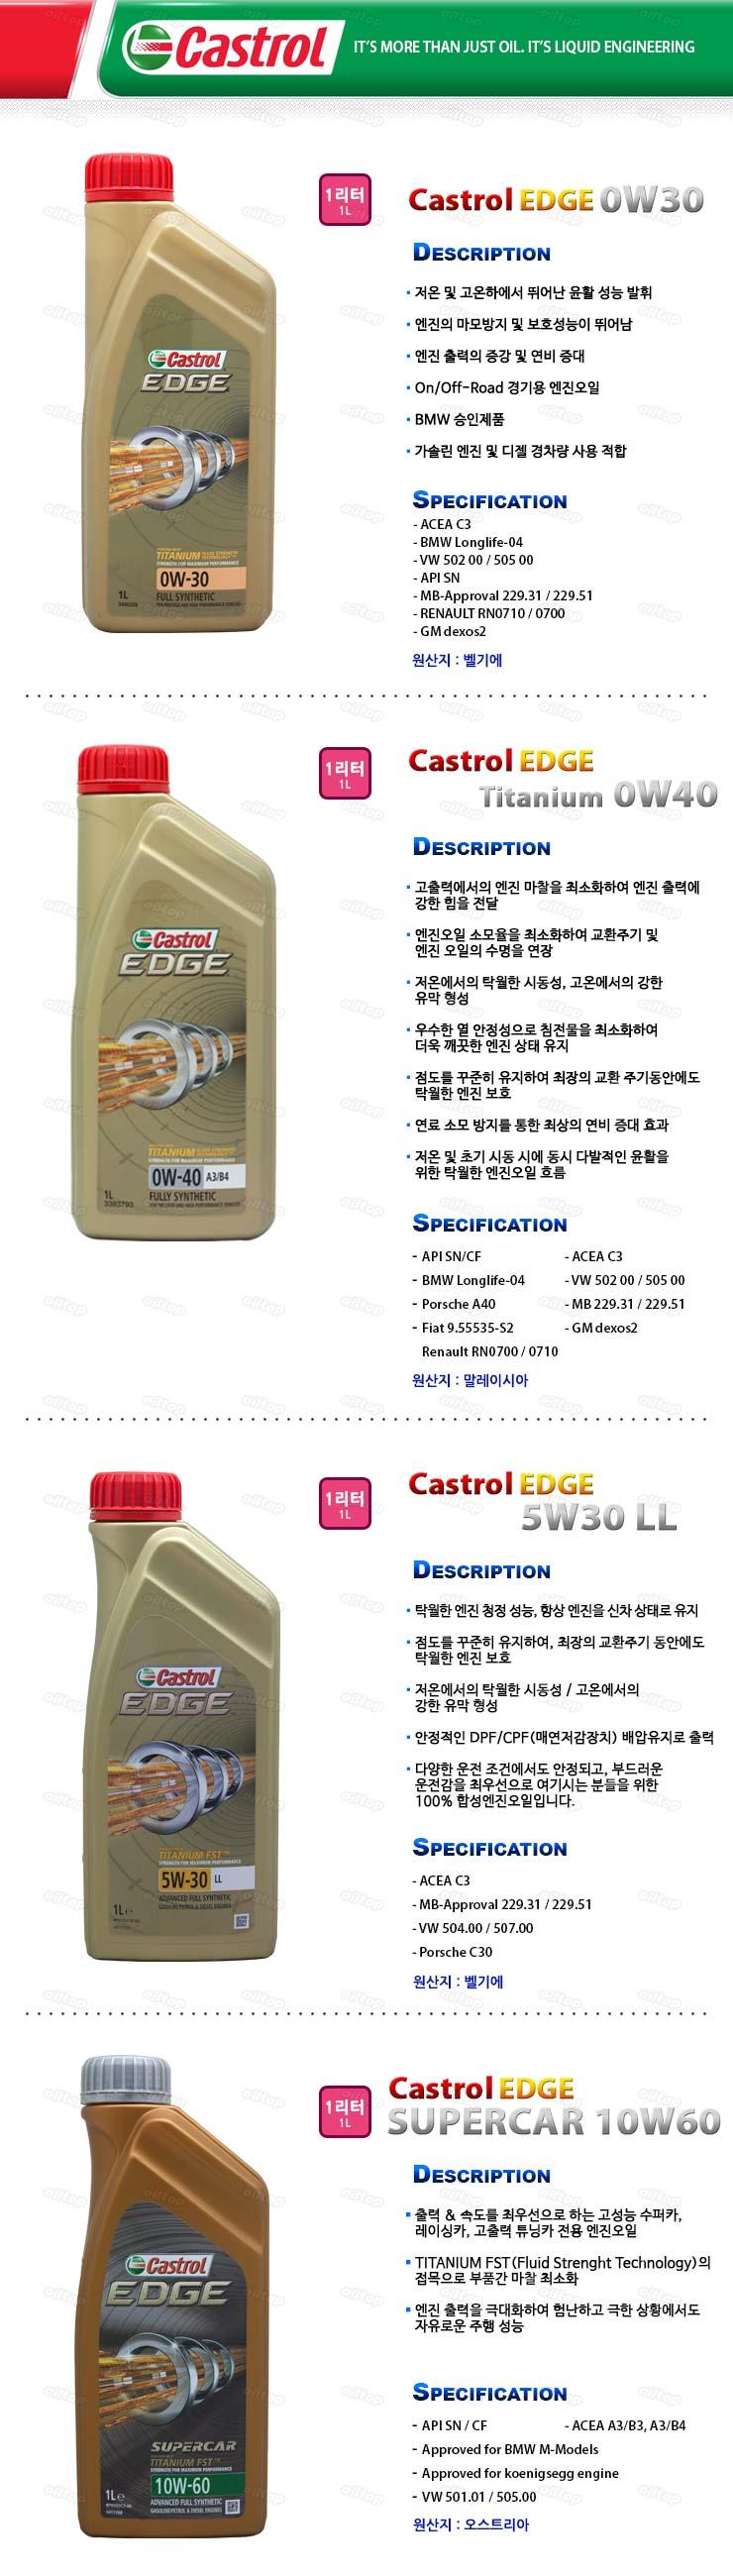 Castrol] EDGE Series/0W20/Professional 0W30/TITANIUM 0W40